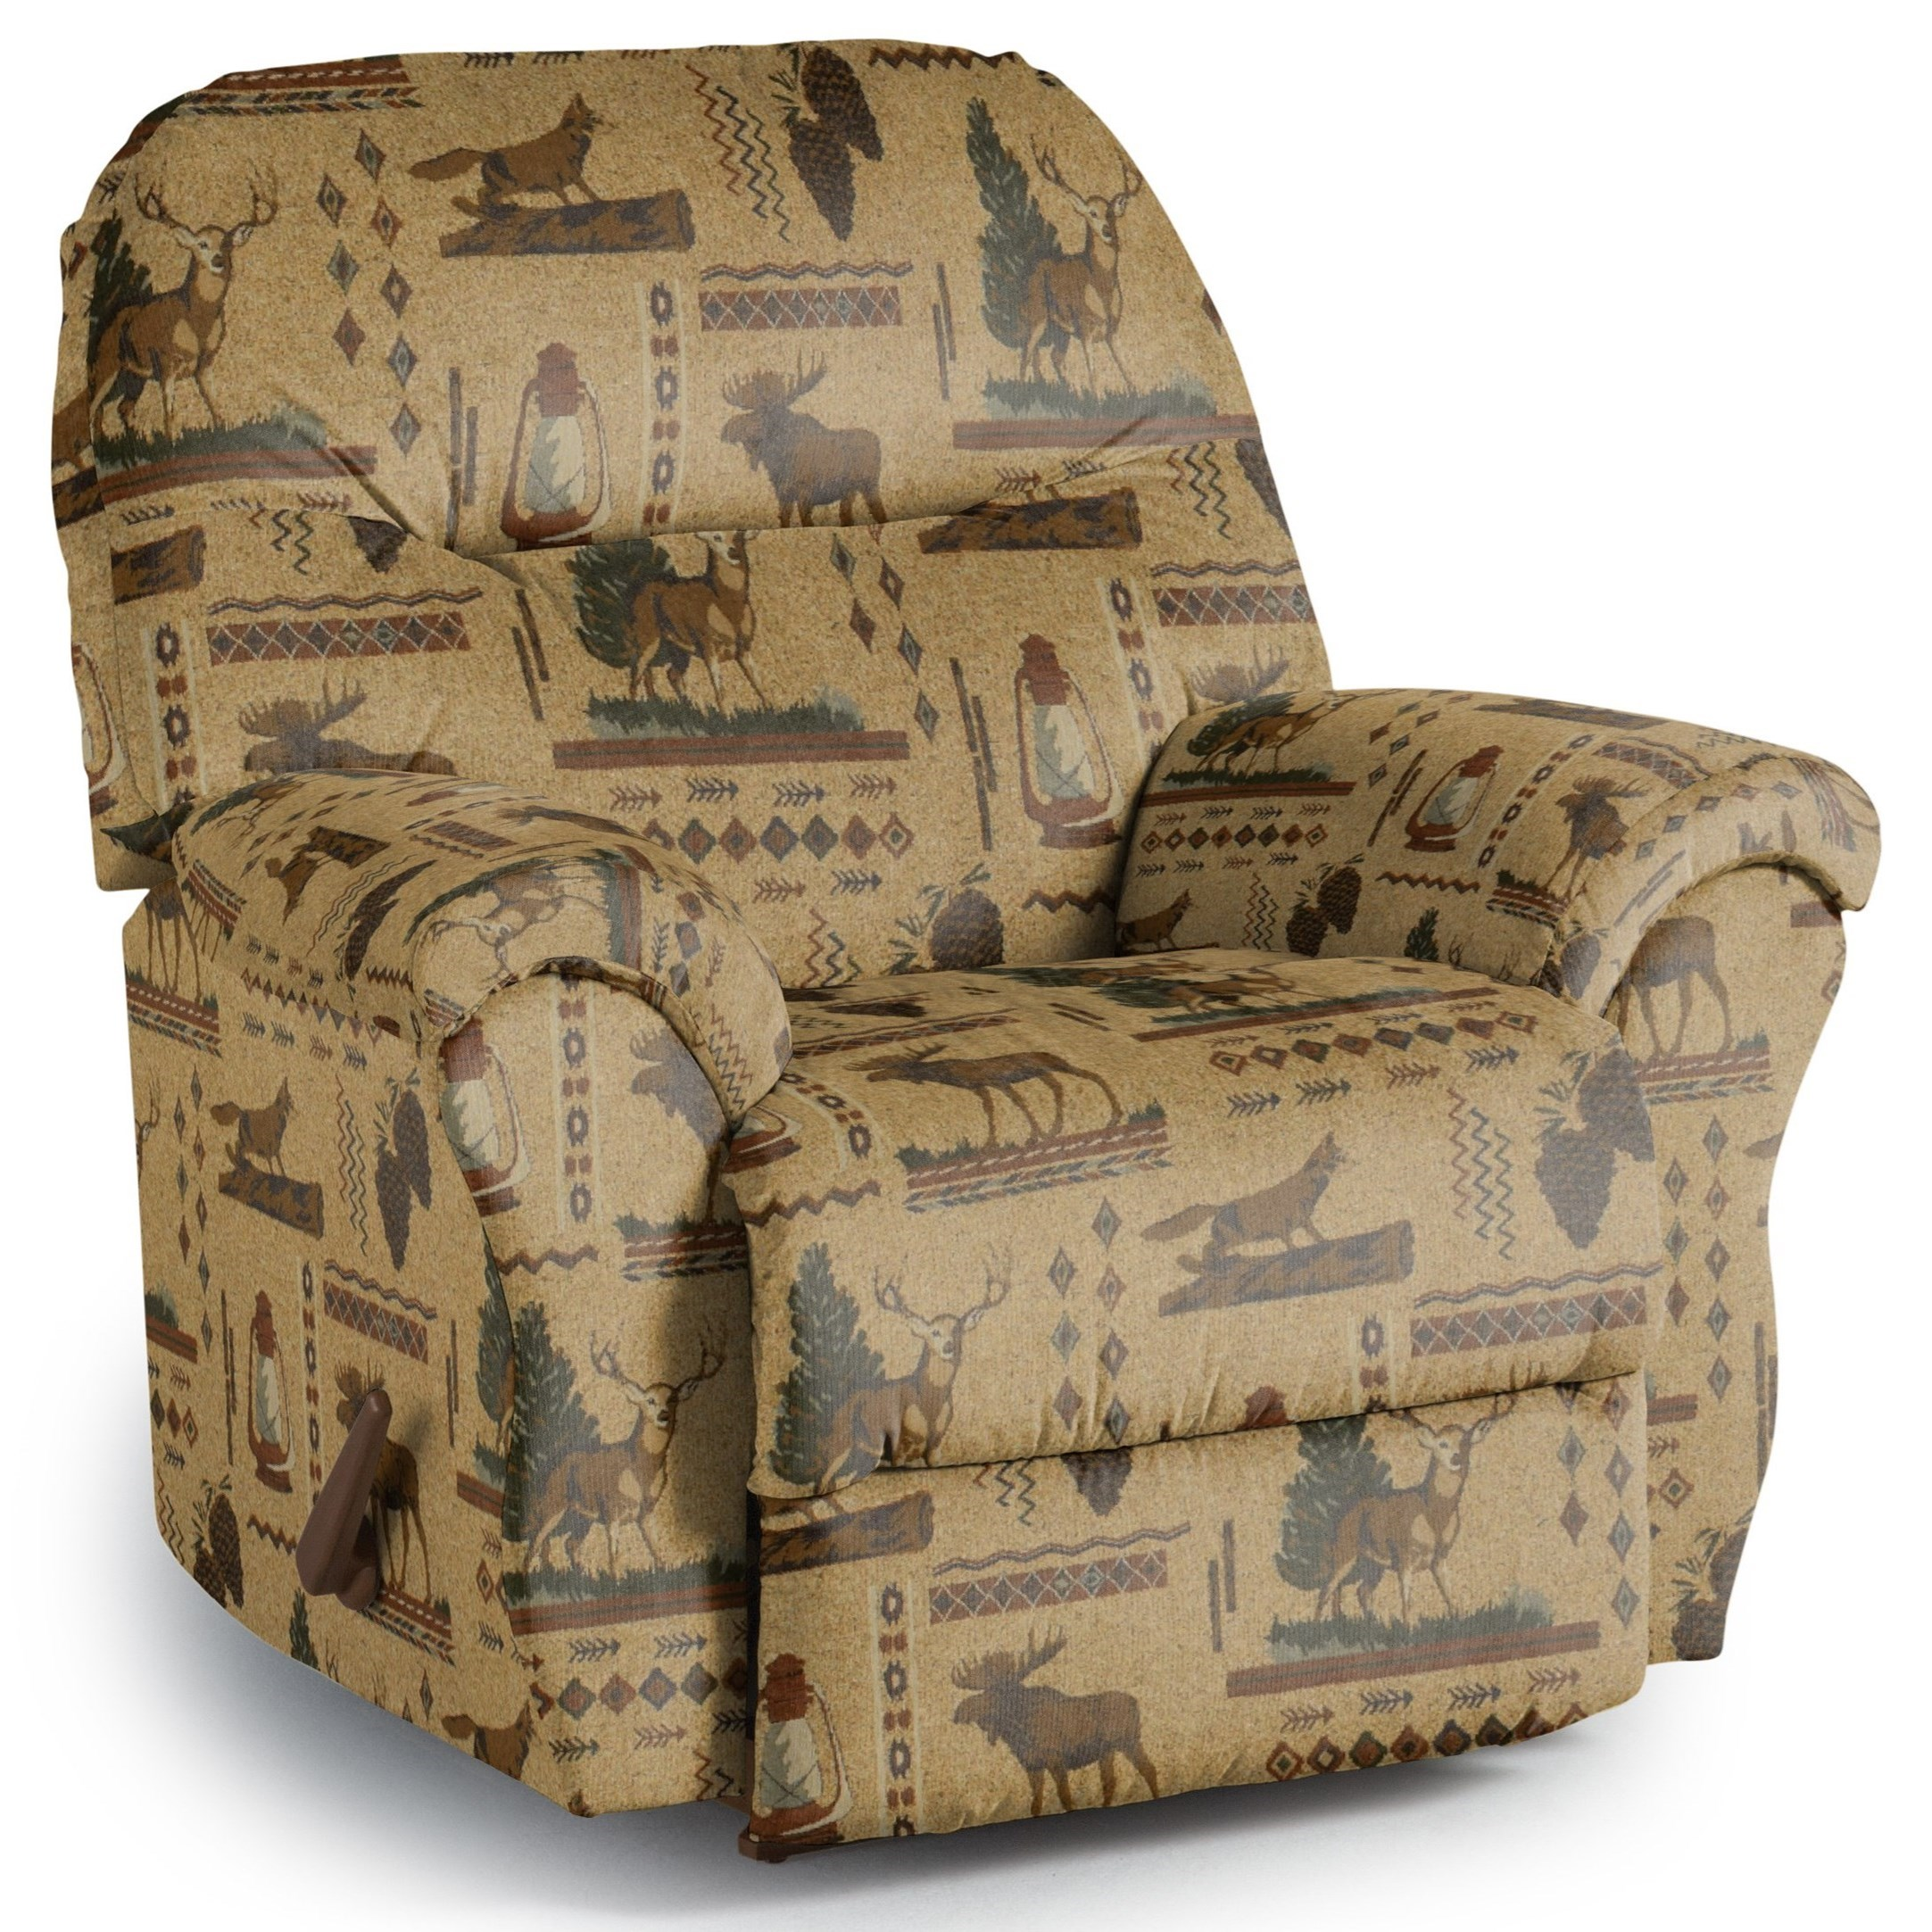 Medium Recliners Bodie Rocker Recliner by Best Home Furnishings at Lucas Furniture & Mattress